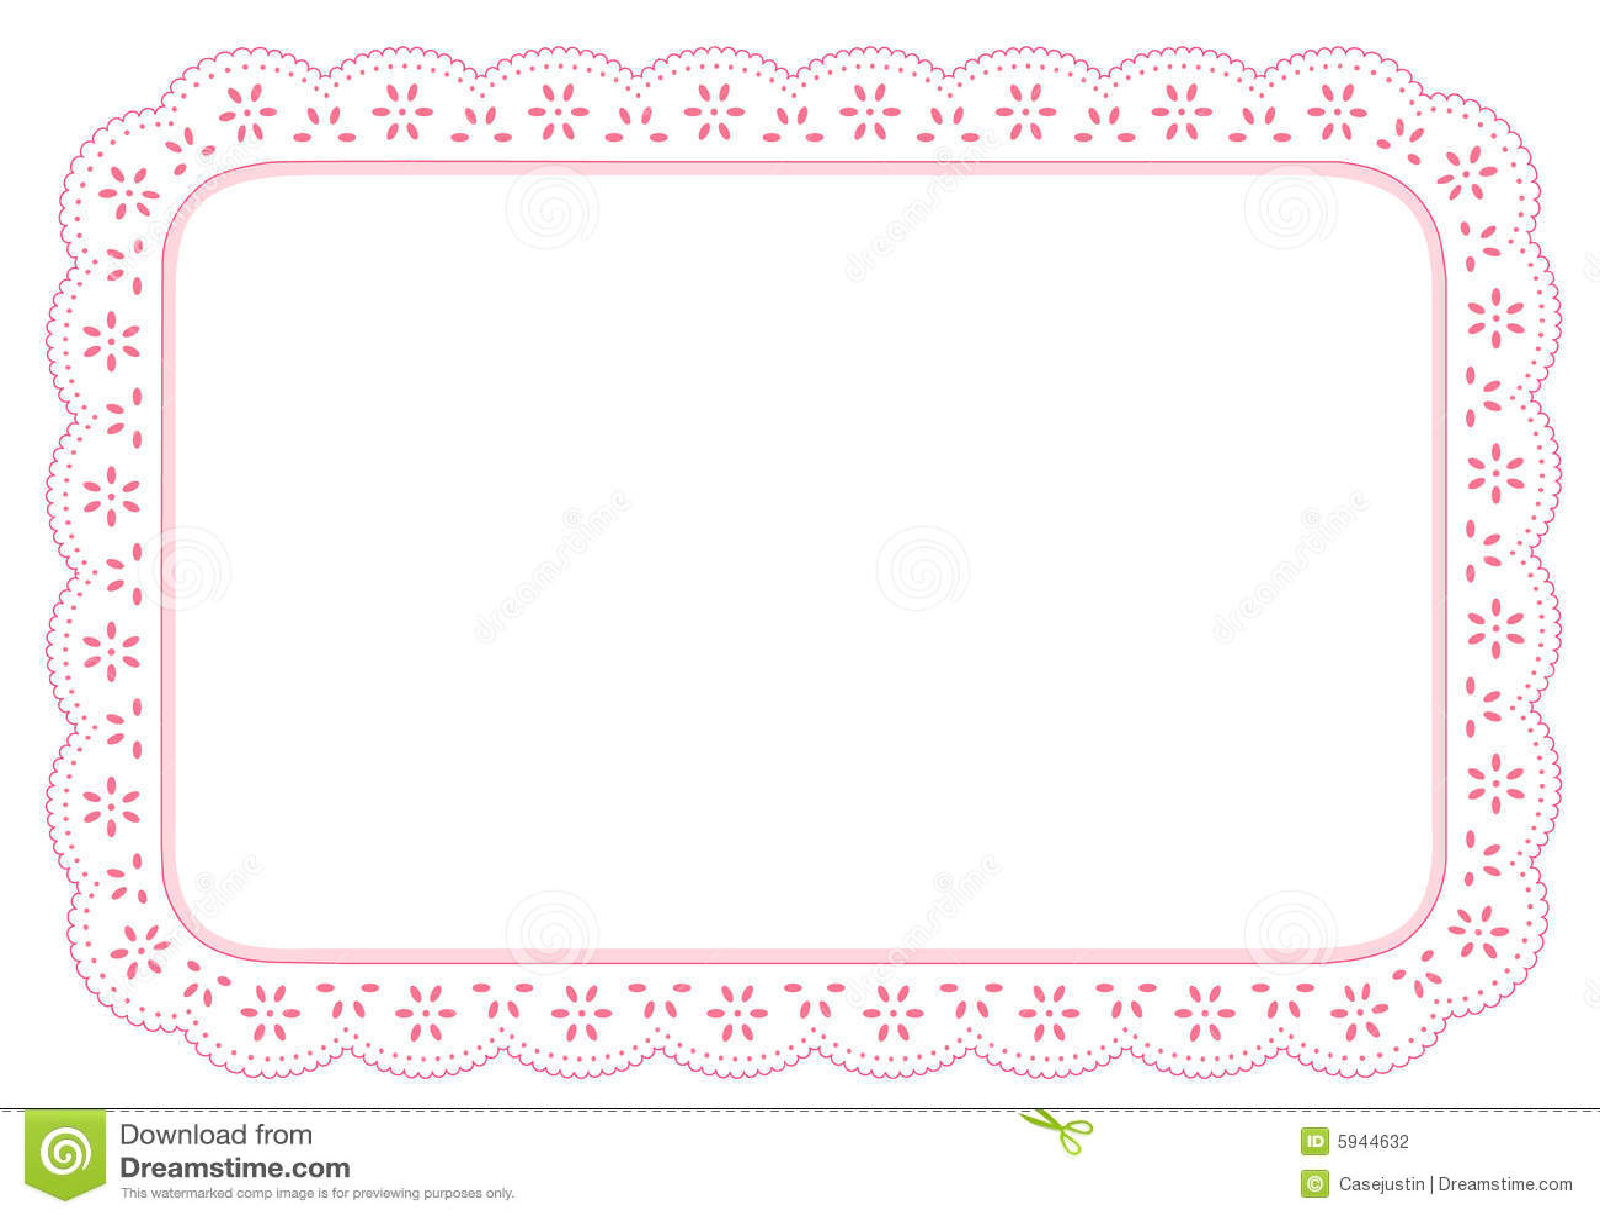 Lace Place Mat, Pink Eyelet